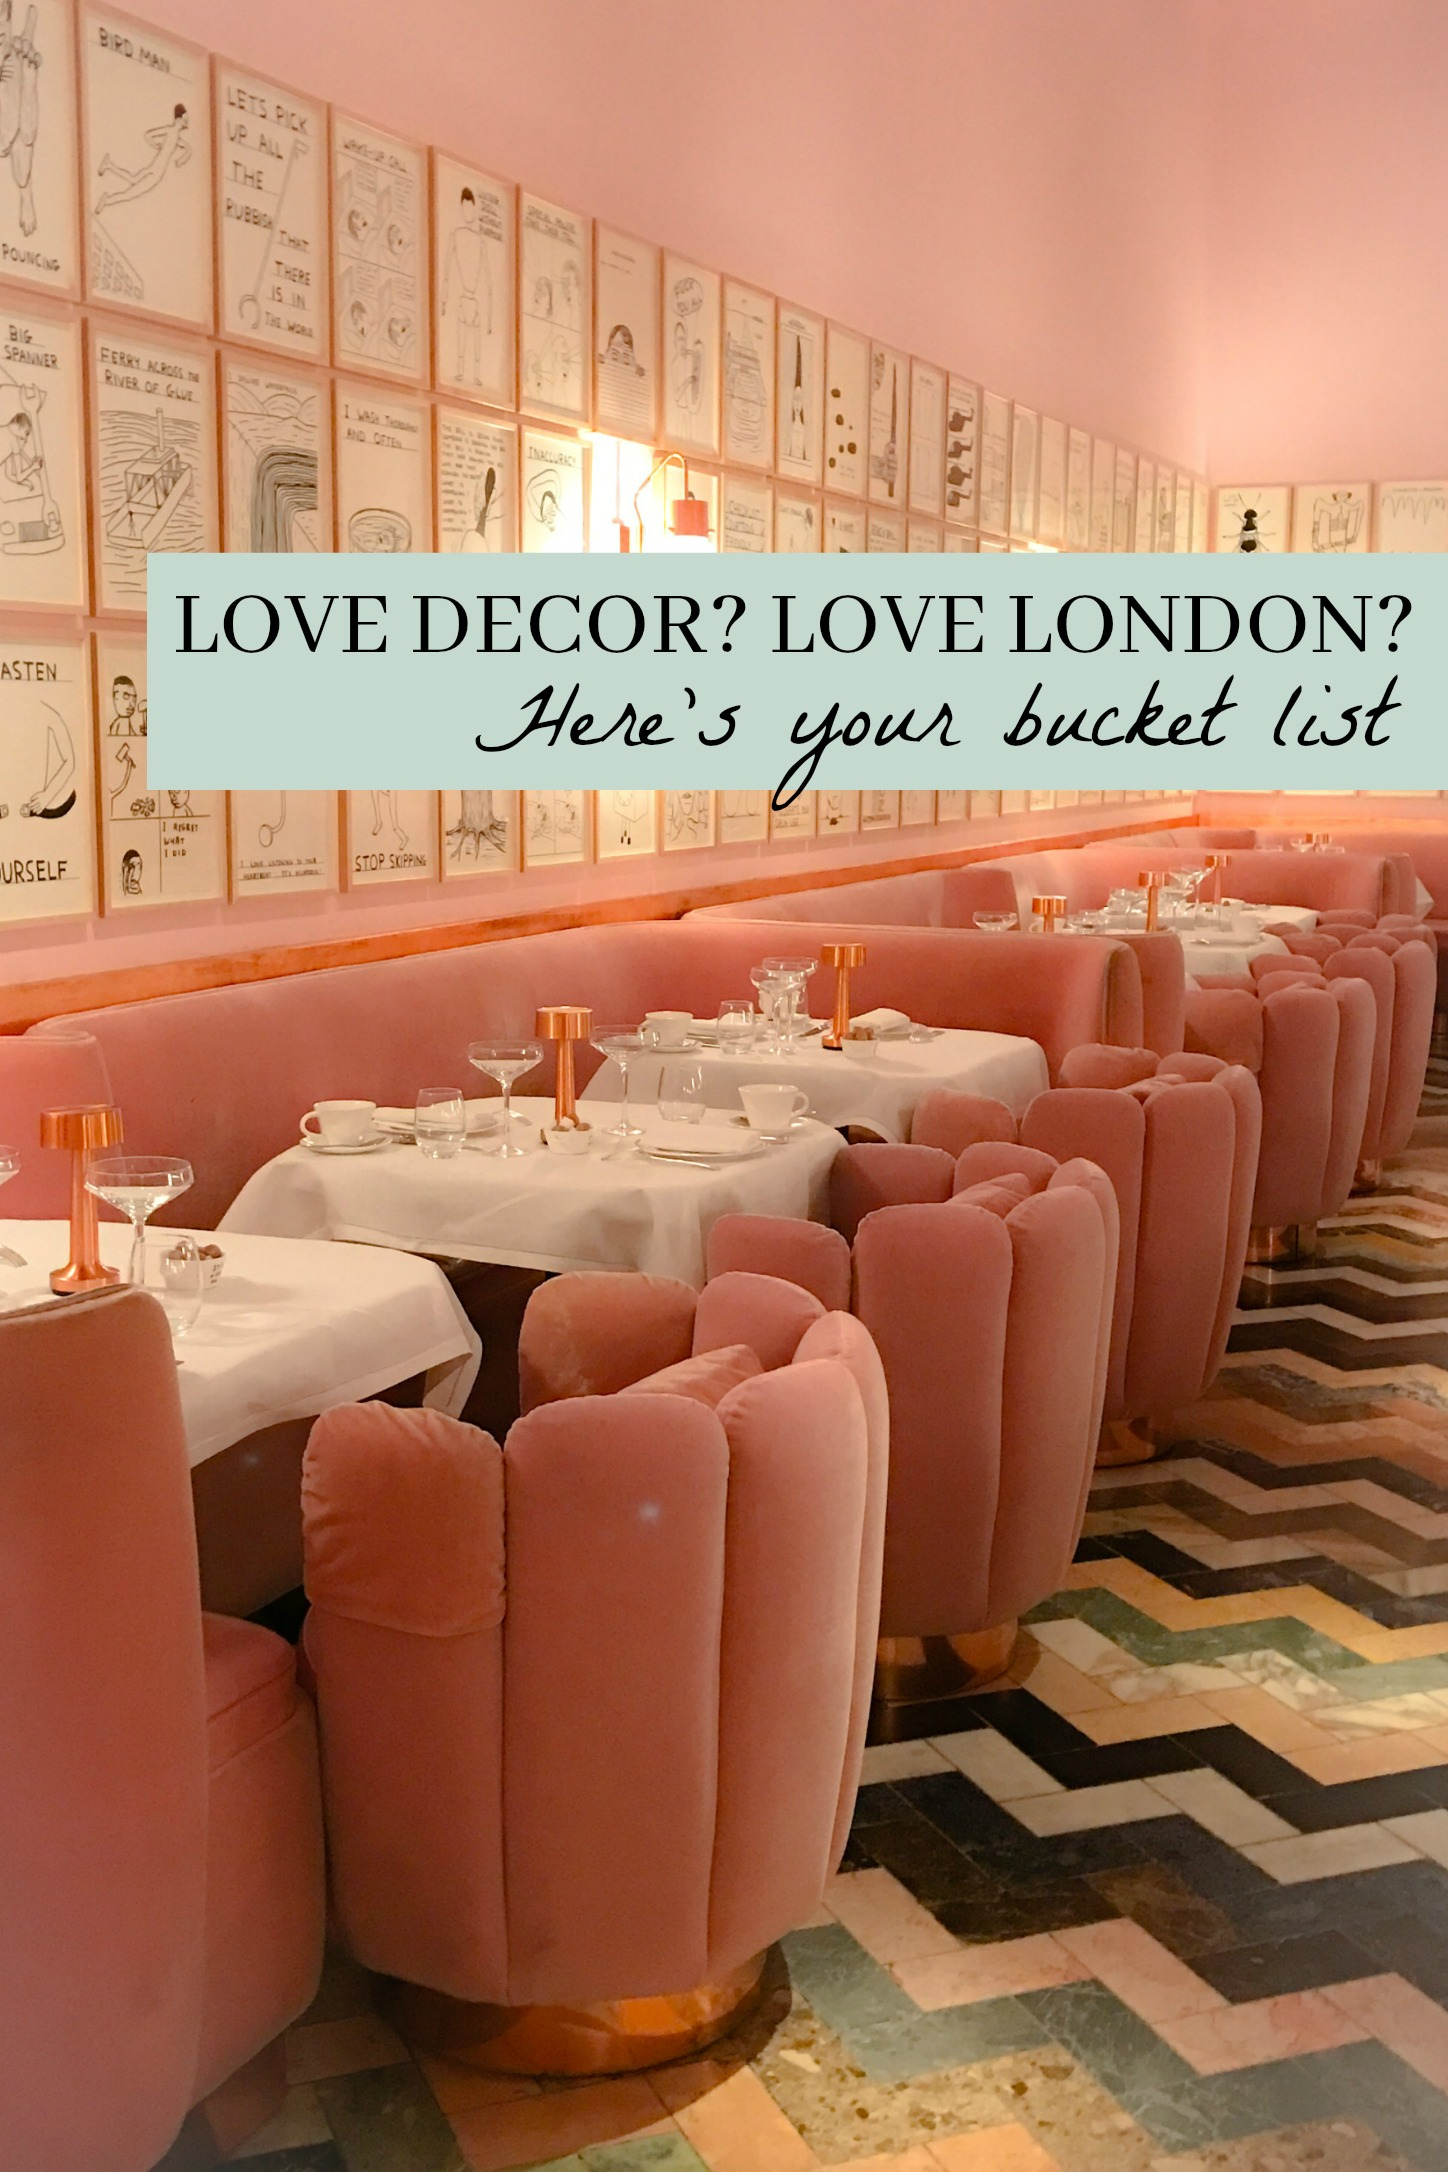 LOVE DECOR? HERE'S YOUR LONDON BUCKET LIST